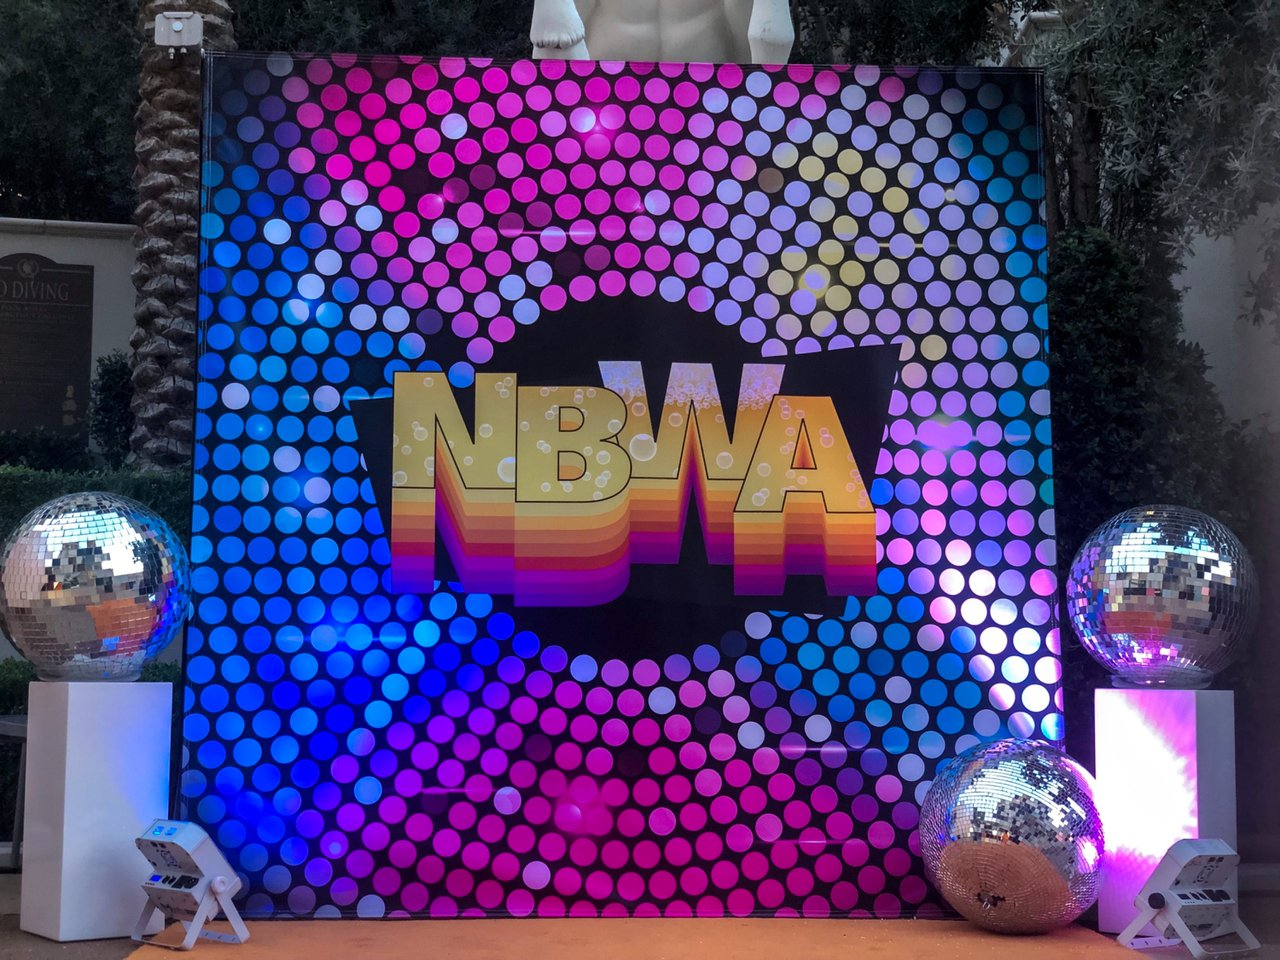 NBWA 82nd Annual Convention photo 12CA5940-0D78-456C-AC0A-249753989F5F.jpg